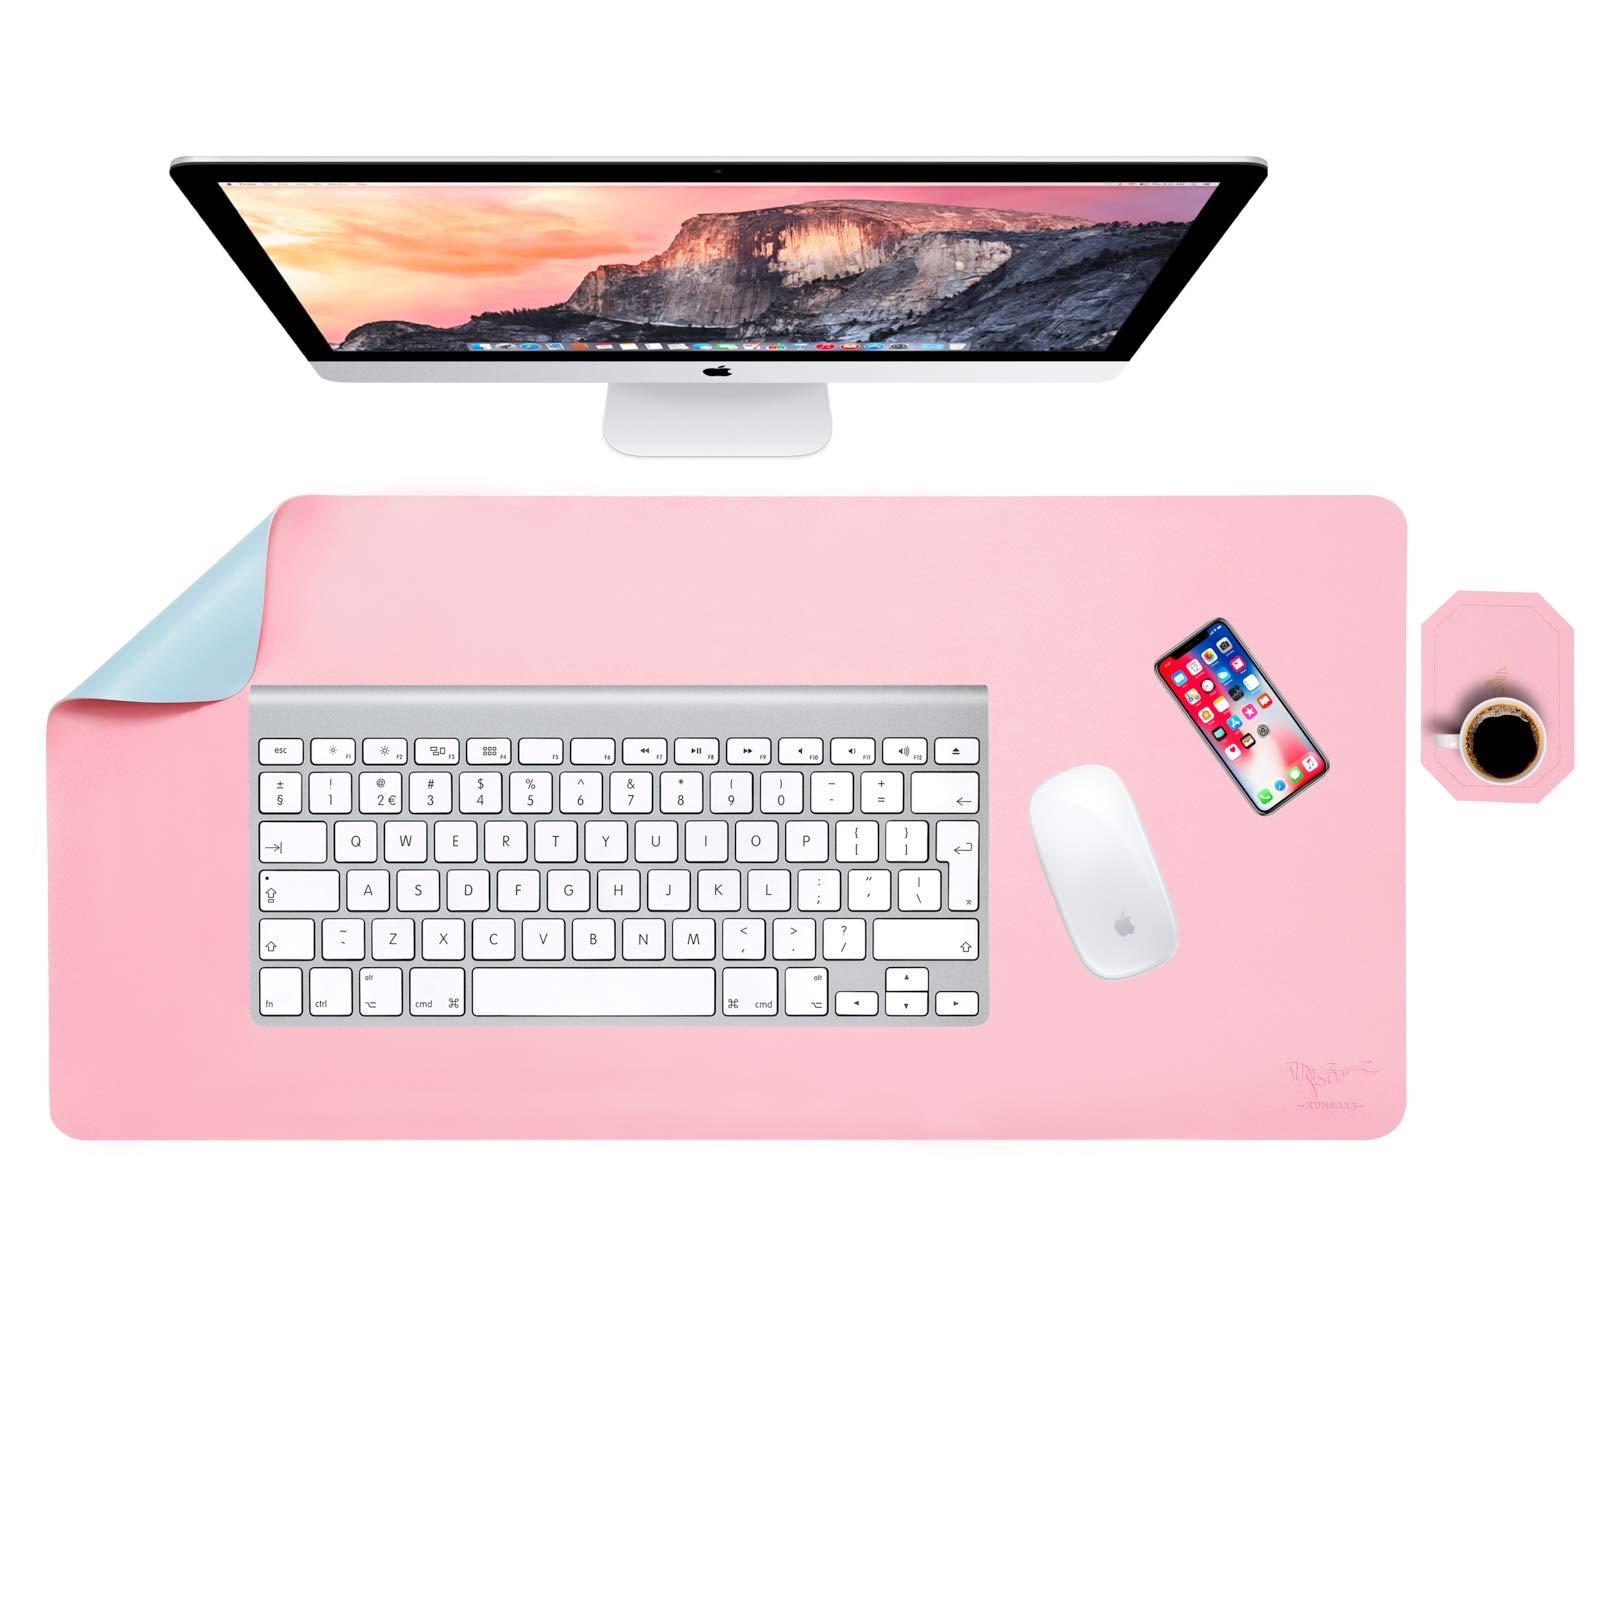 KUNSOAR Desk Pad Large Mouse Pad Dual Sided Desk Mat for Home